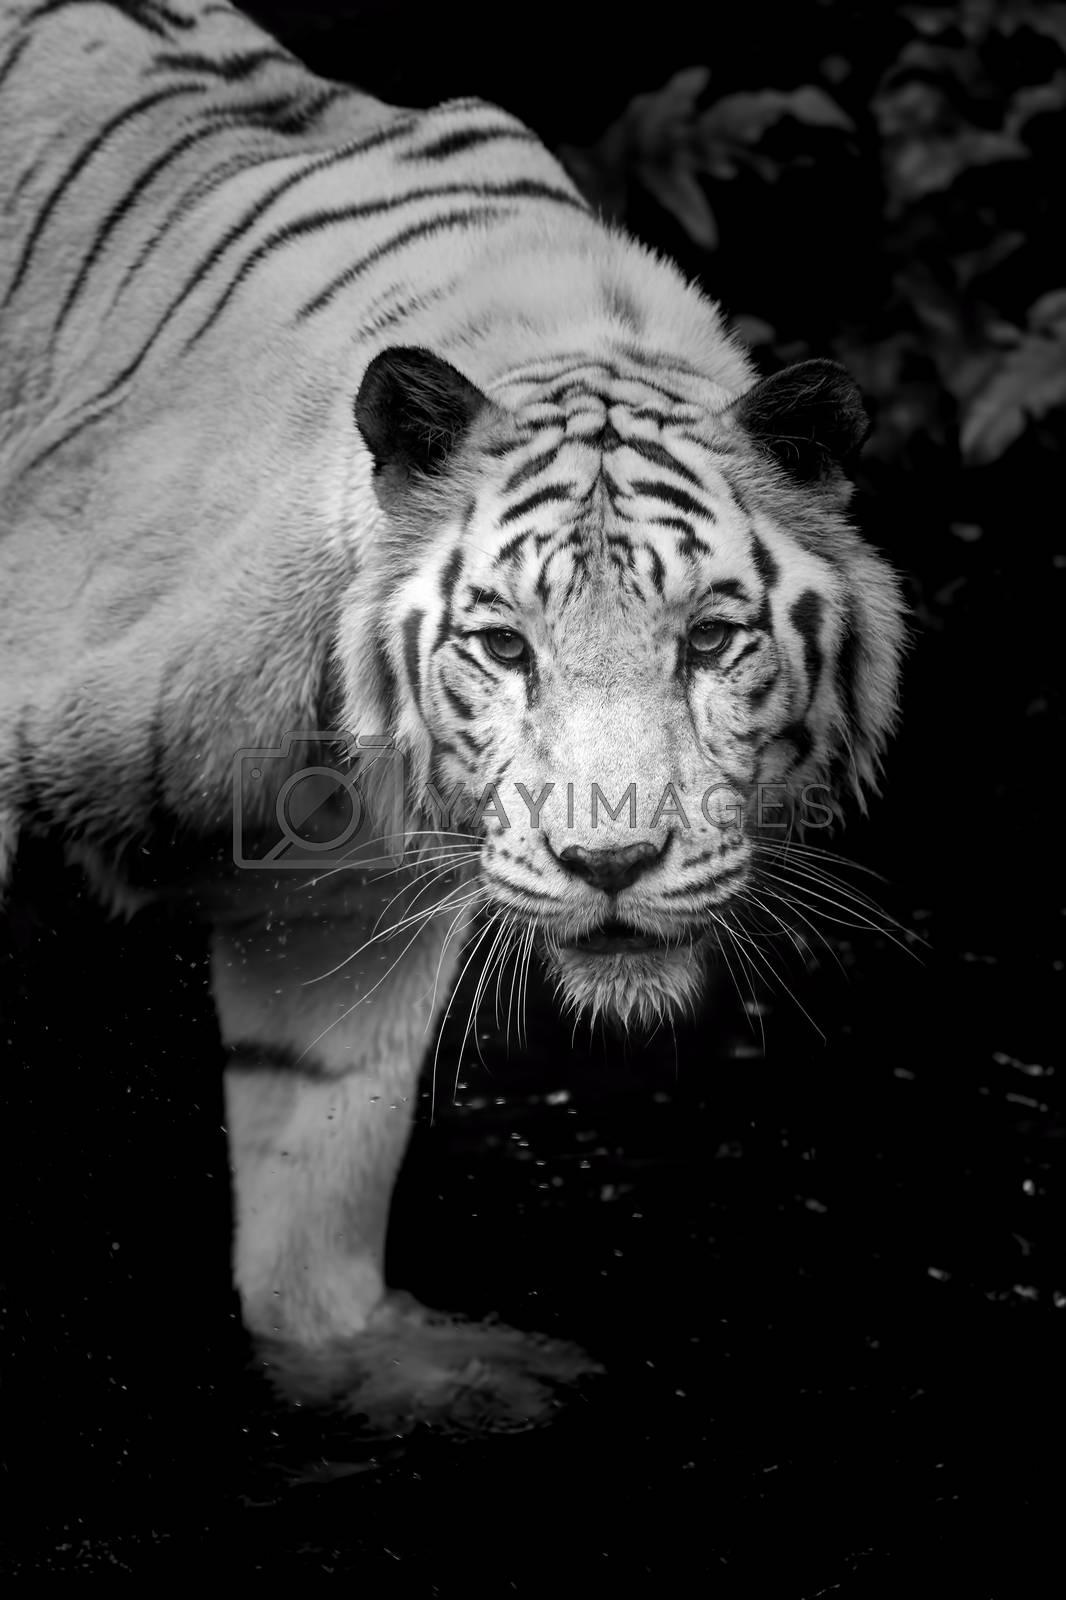 Black and white portrait of a White Tiger